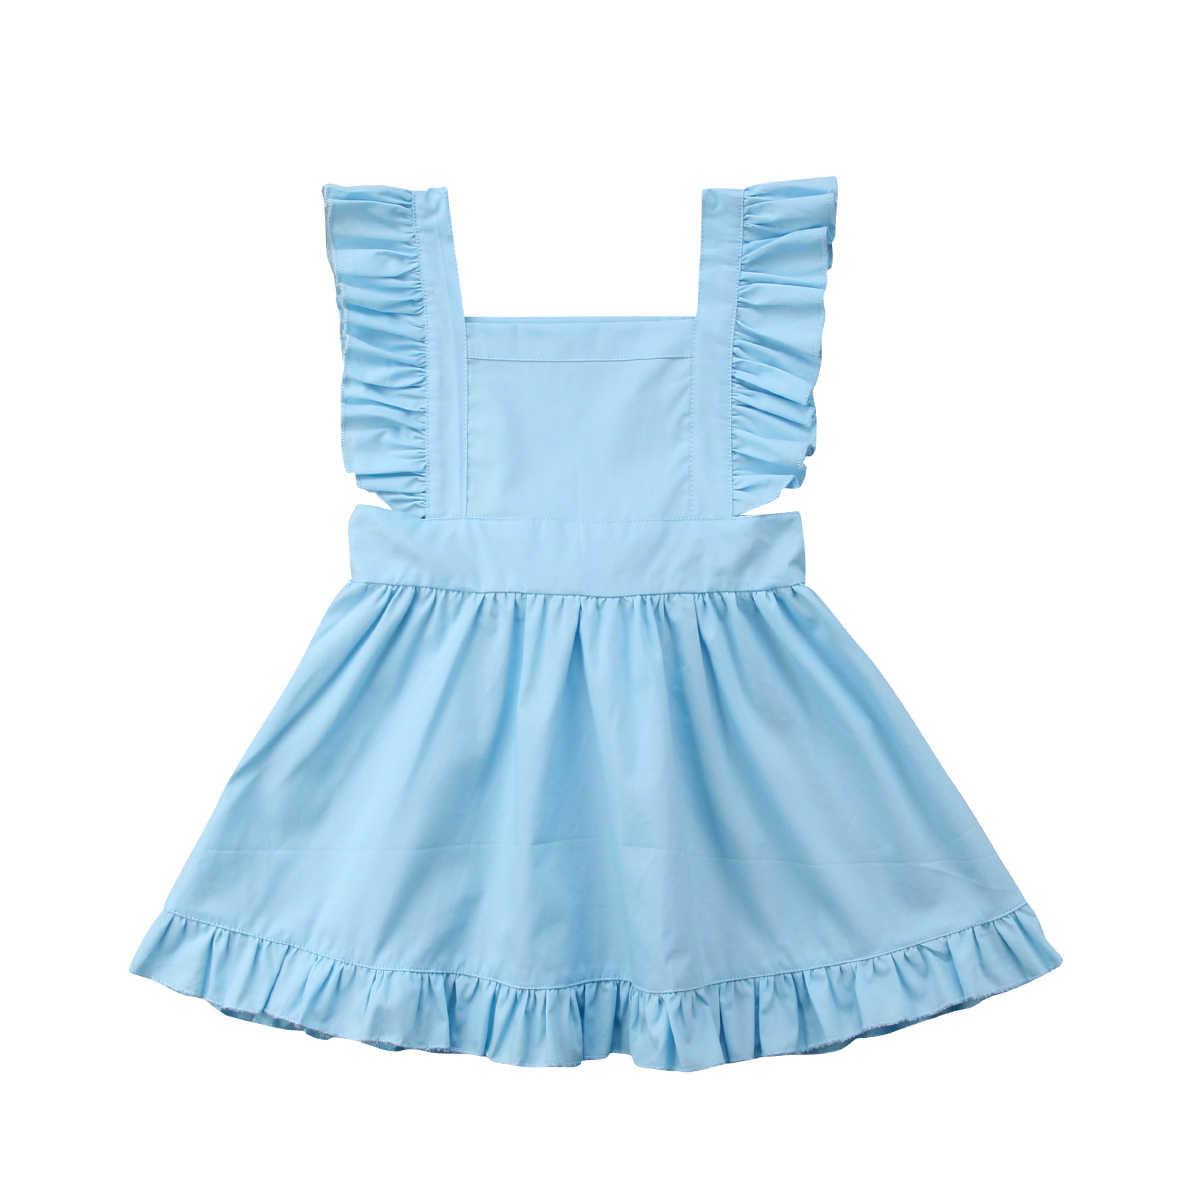 1e903e9f93a 0-5Y Newborn Infant Kids Baby Girl Summer Blue Tutu Dress Princess Party  Wedding Bowknot